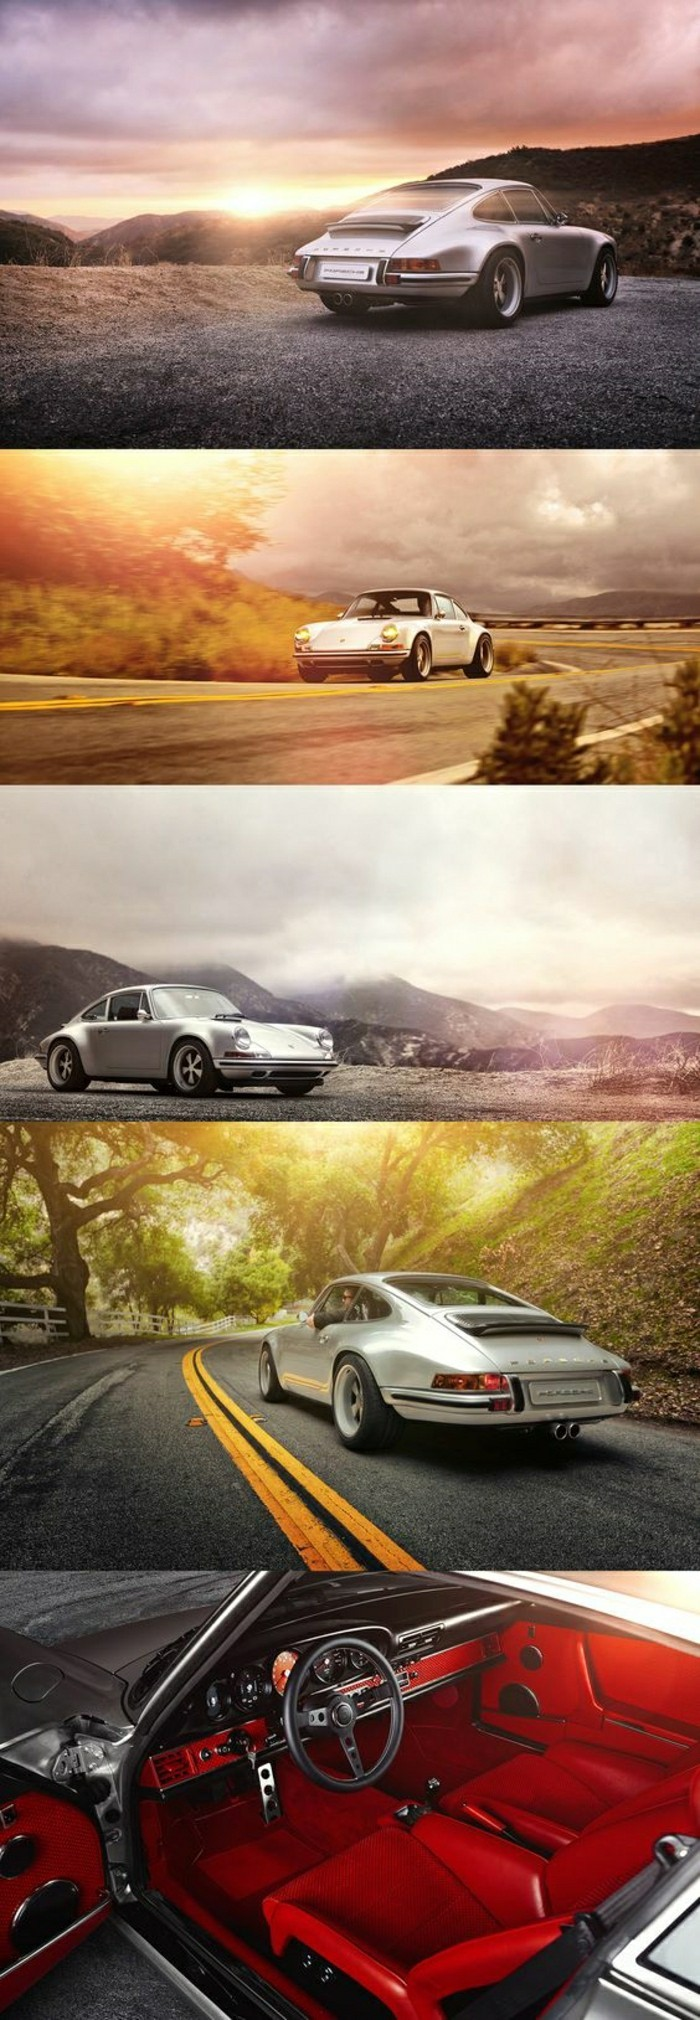 0-vehicules-de-collection-porsche-interieur-porsche-911-voiture-moderne